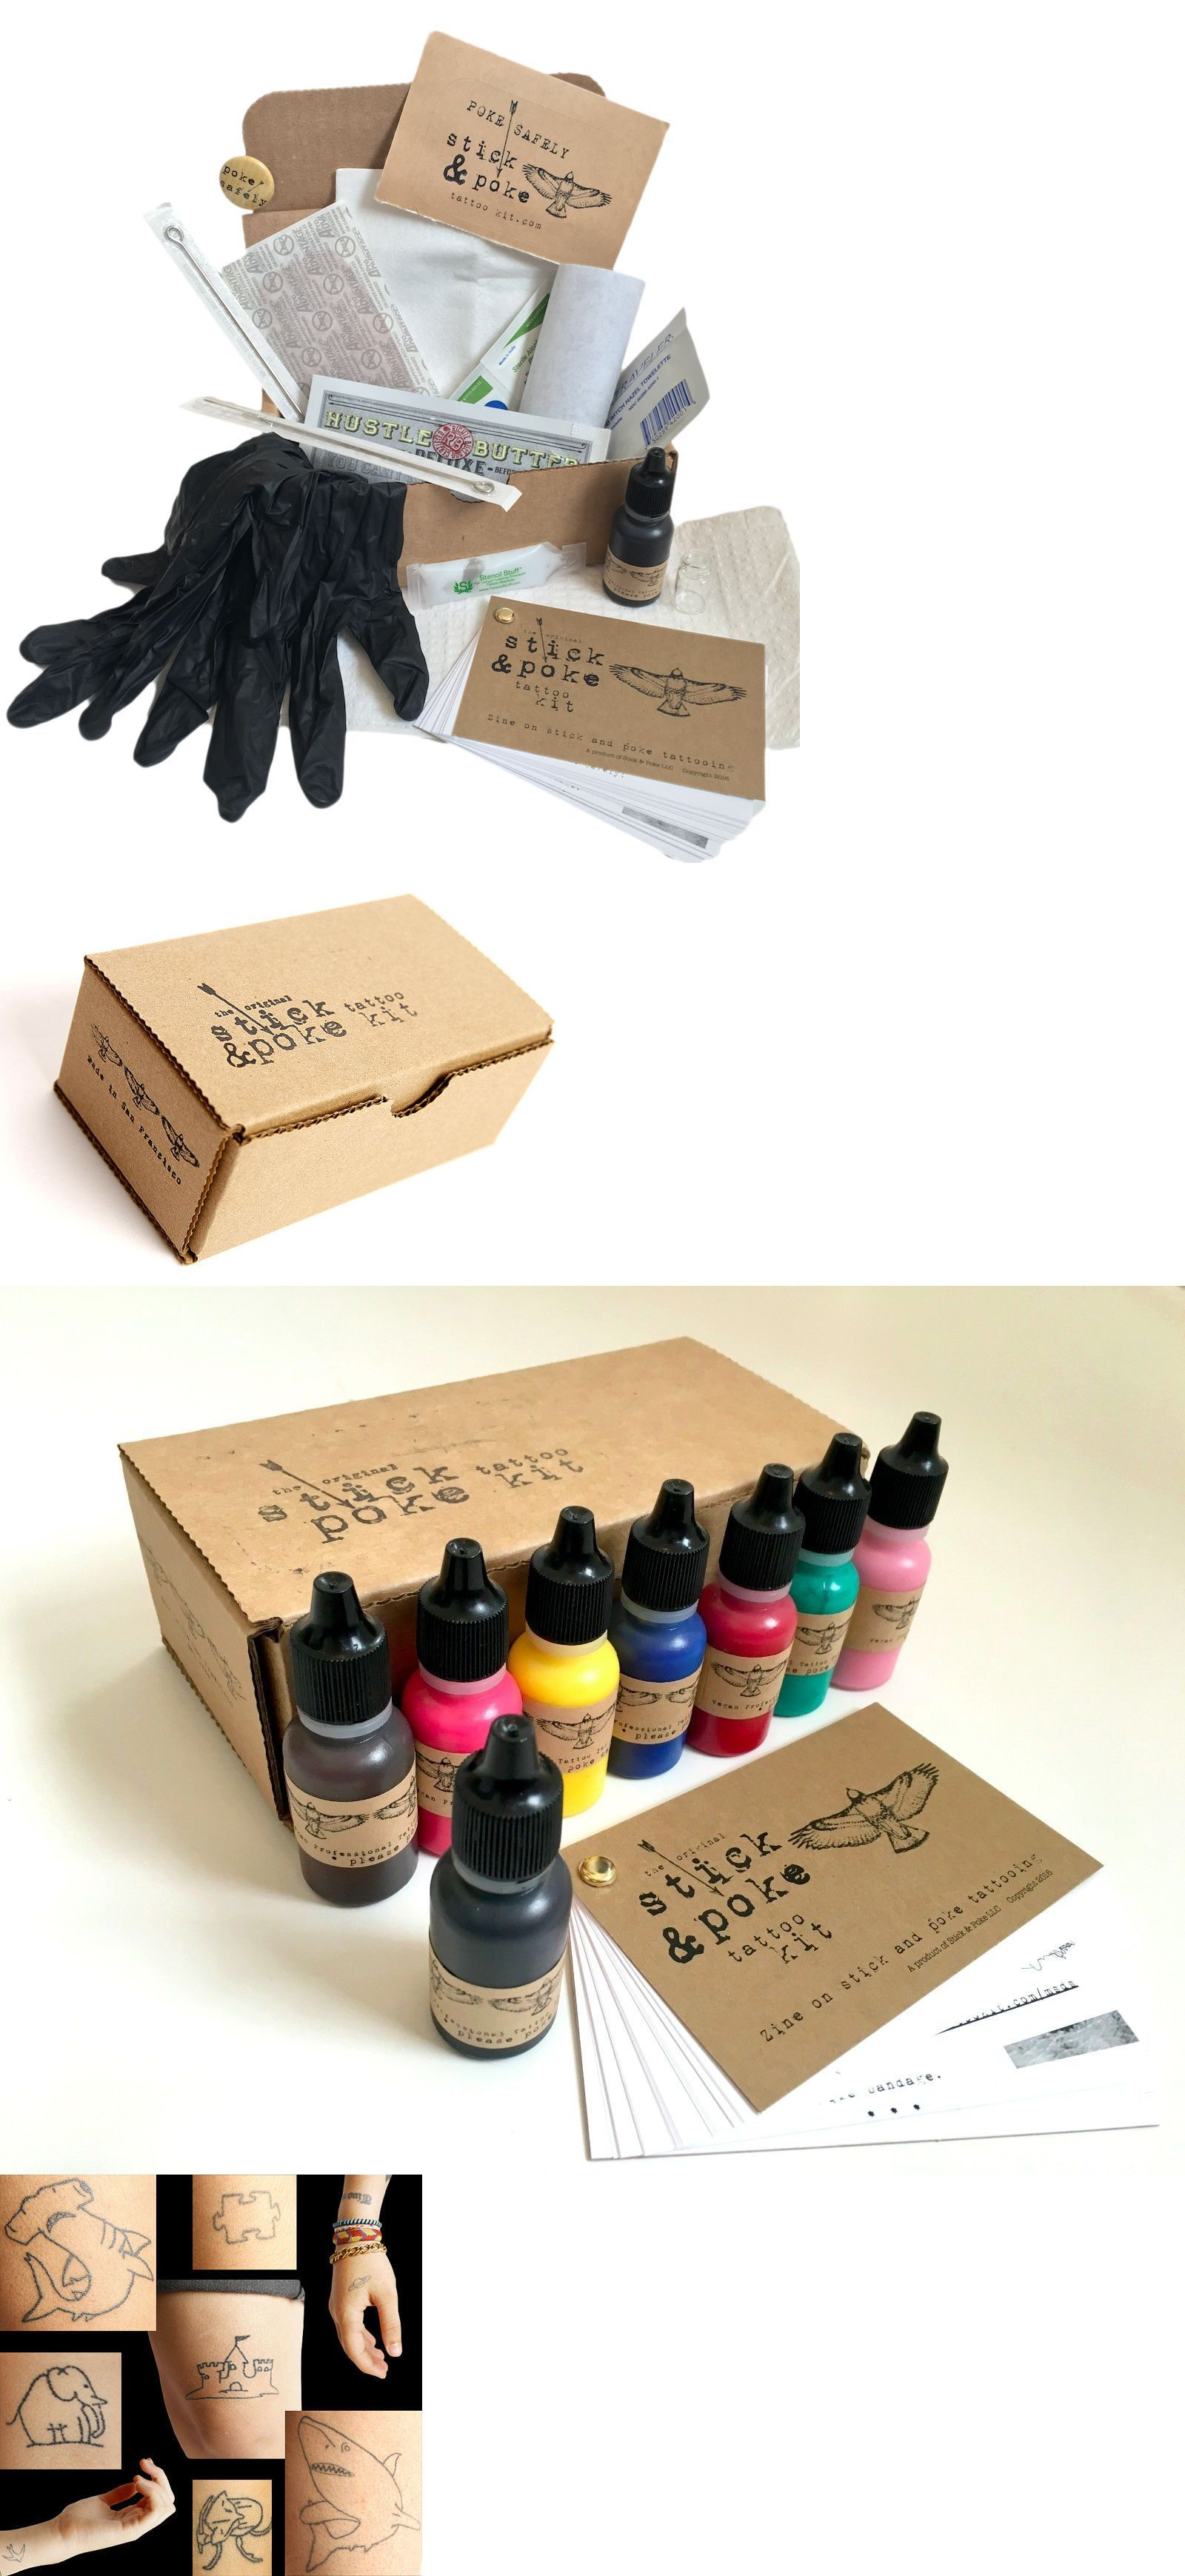 Tattoo Supplies Stick And Poke Single Tattoo Kit > BUY